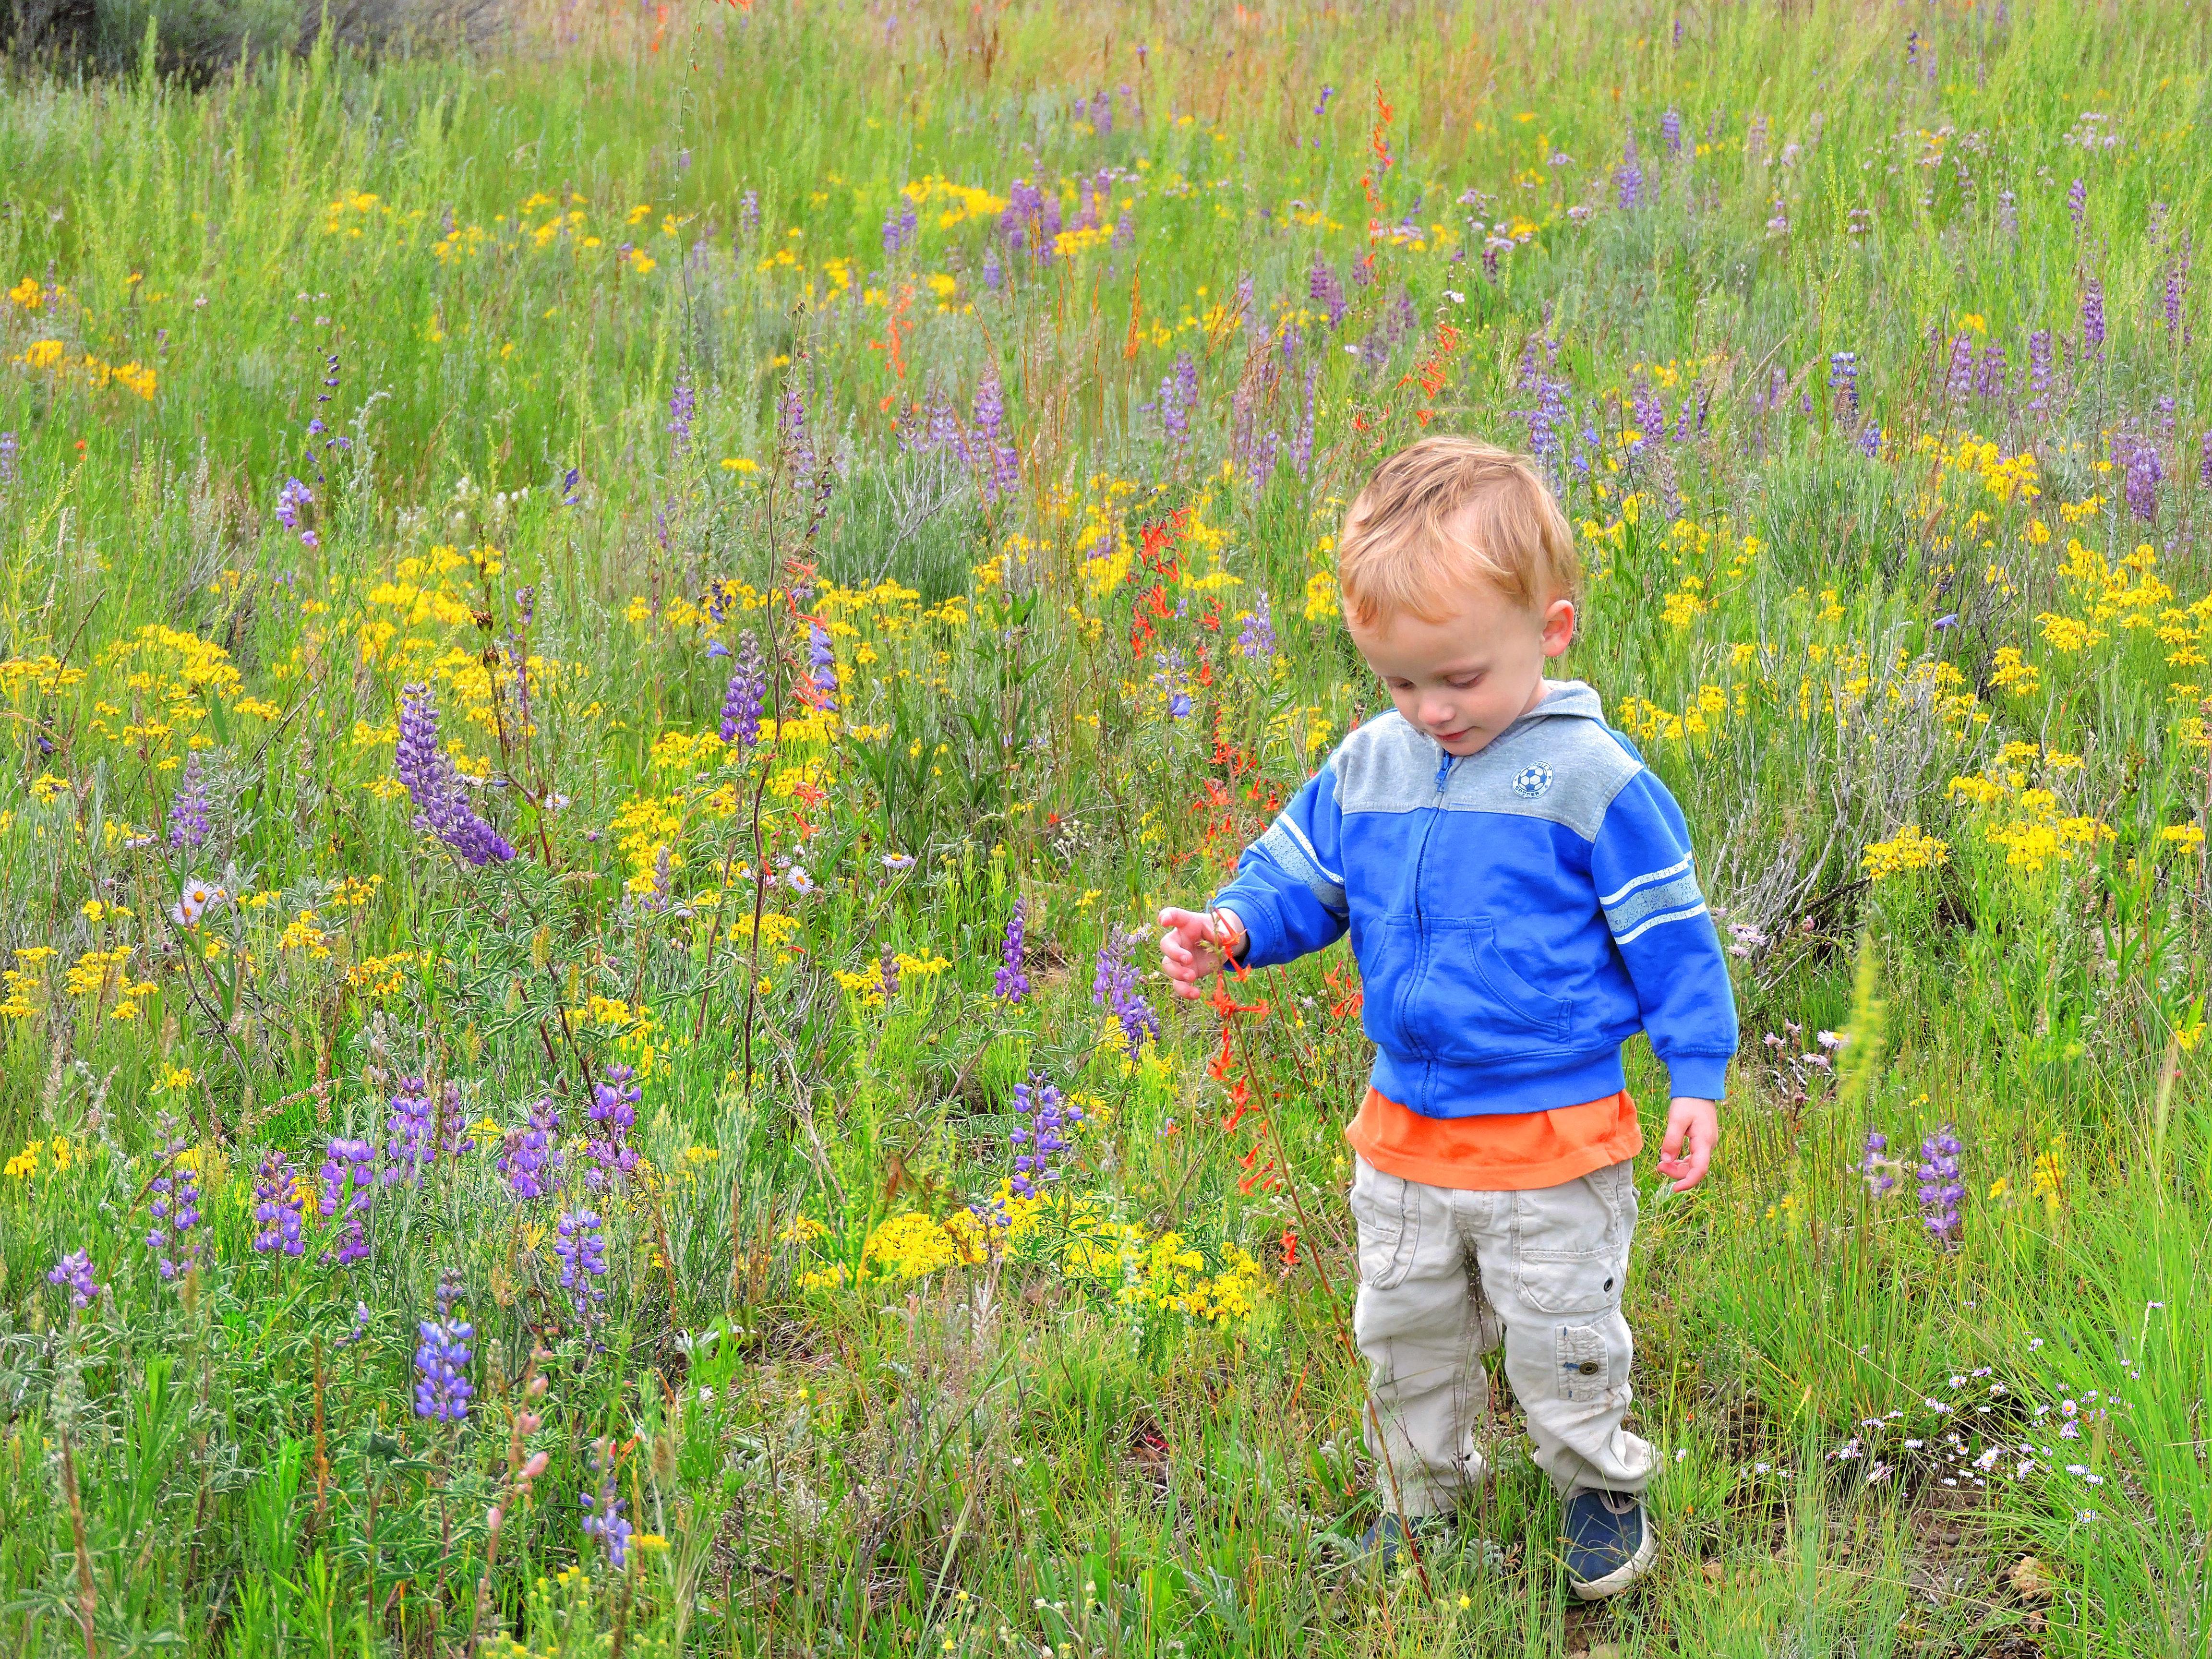 Our children and grandchildren deserve a healthy, vibrant planet.